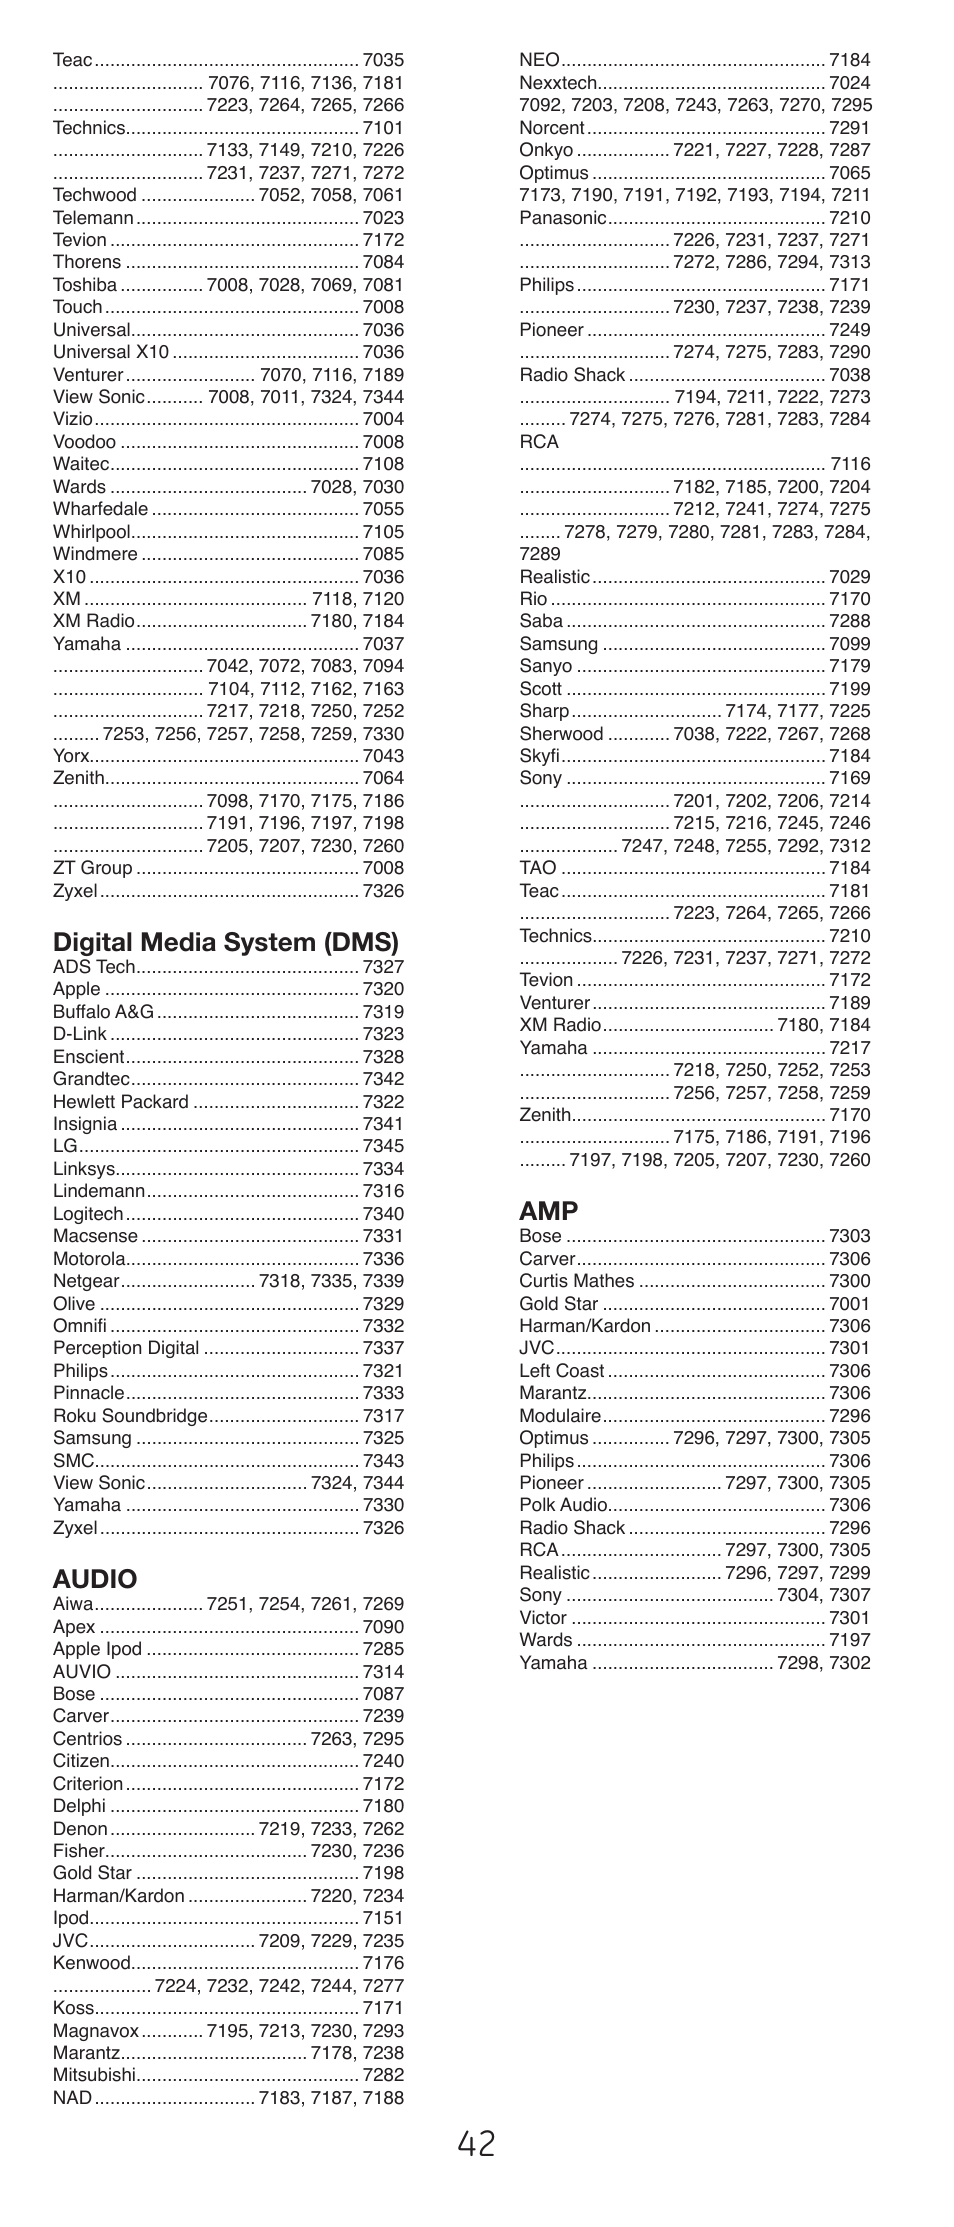 Digital media system (dms), Audio | GE 24912-v2 GE Universal Remote